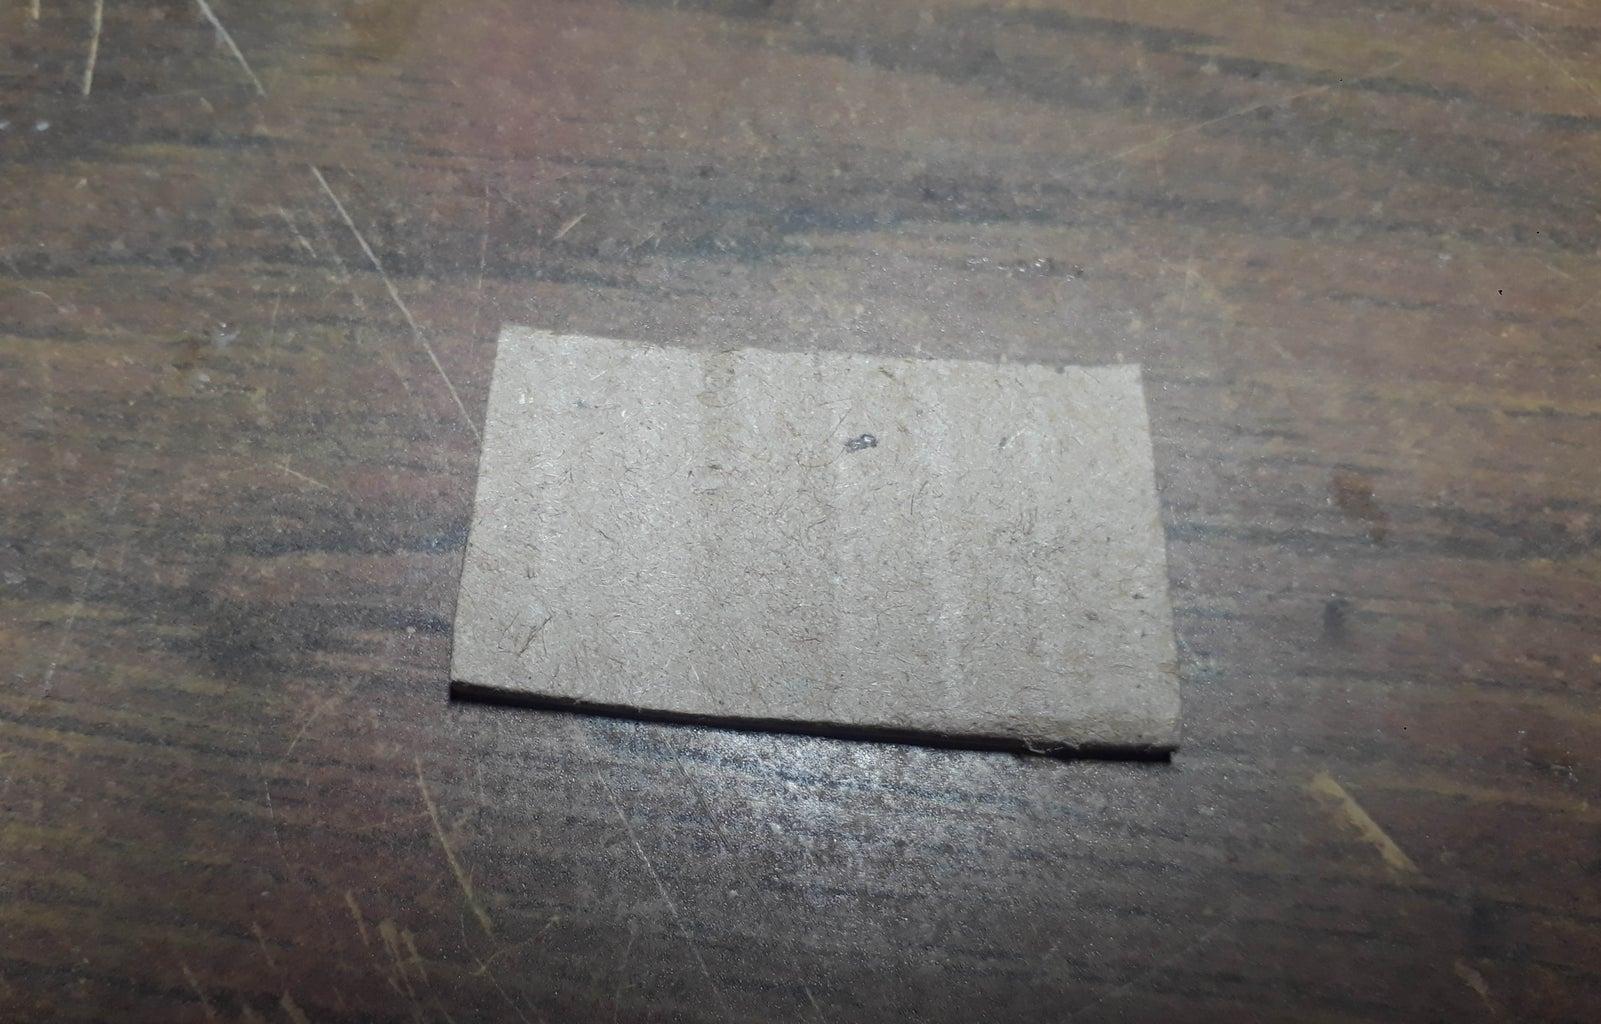 Push Button Using Cardboard and Aluminium Foil